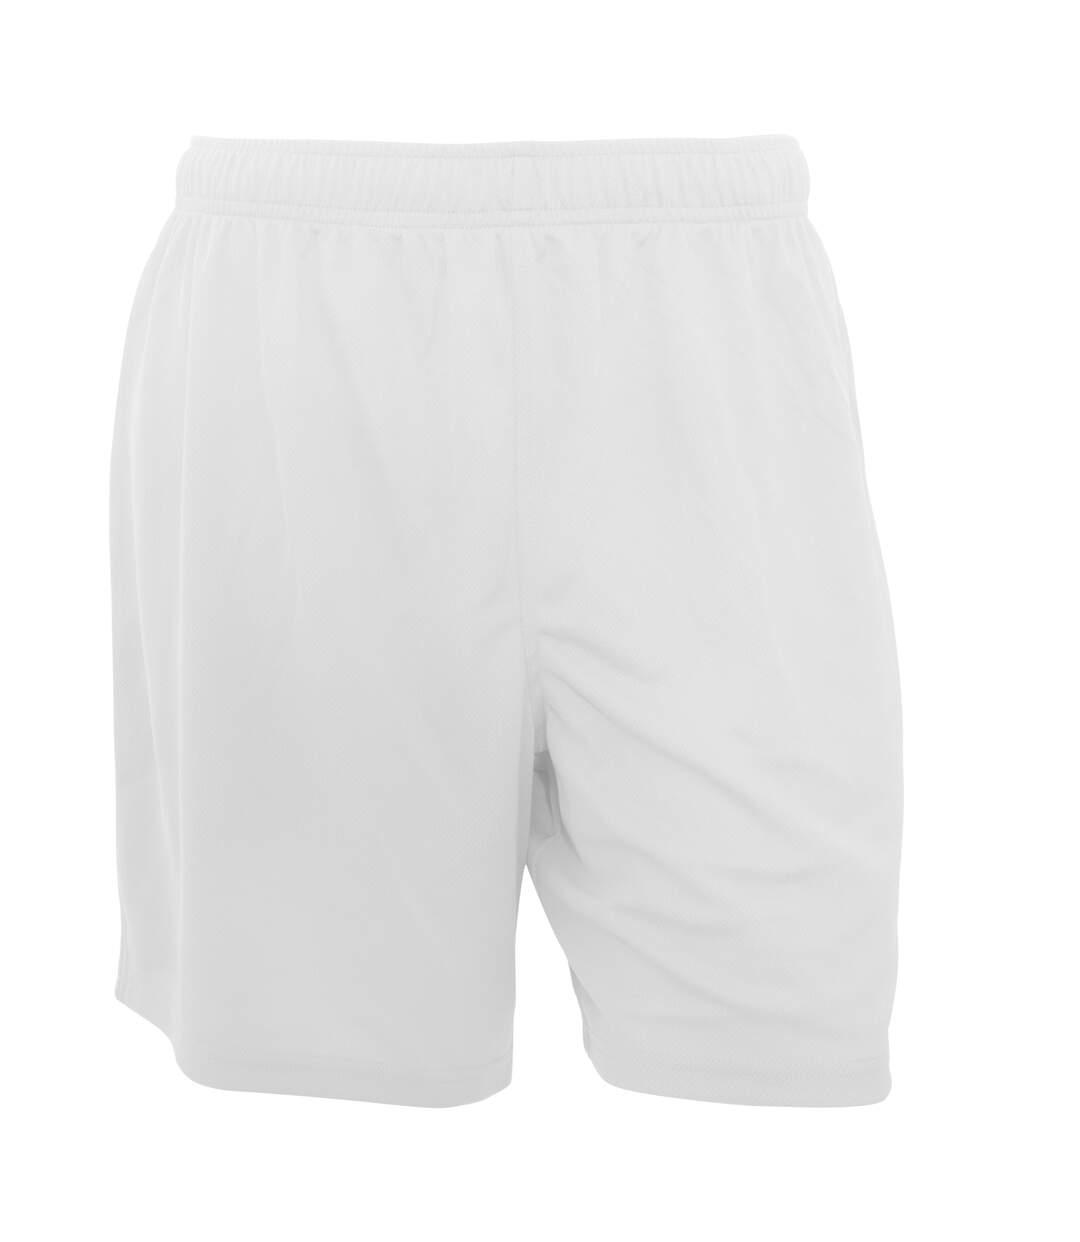 Fruit Of The Loom Mens Moisture Wicking Performance Sport Shorts (Deep Navy) - UTRW4717